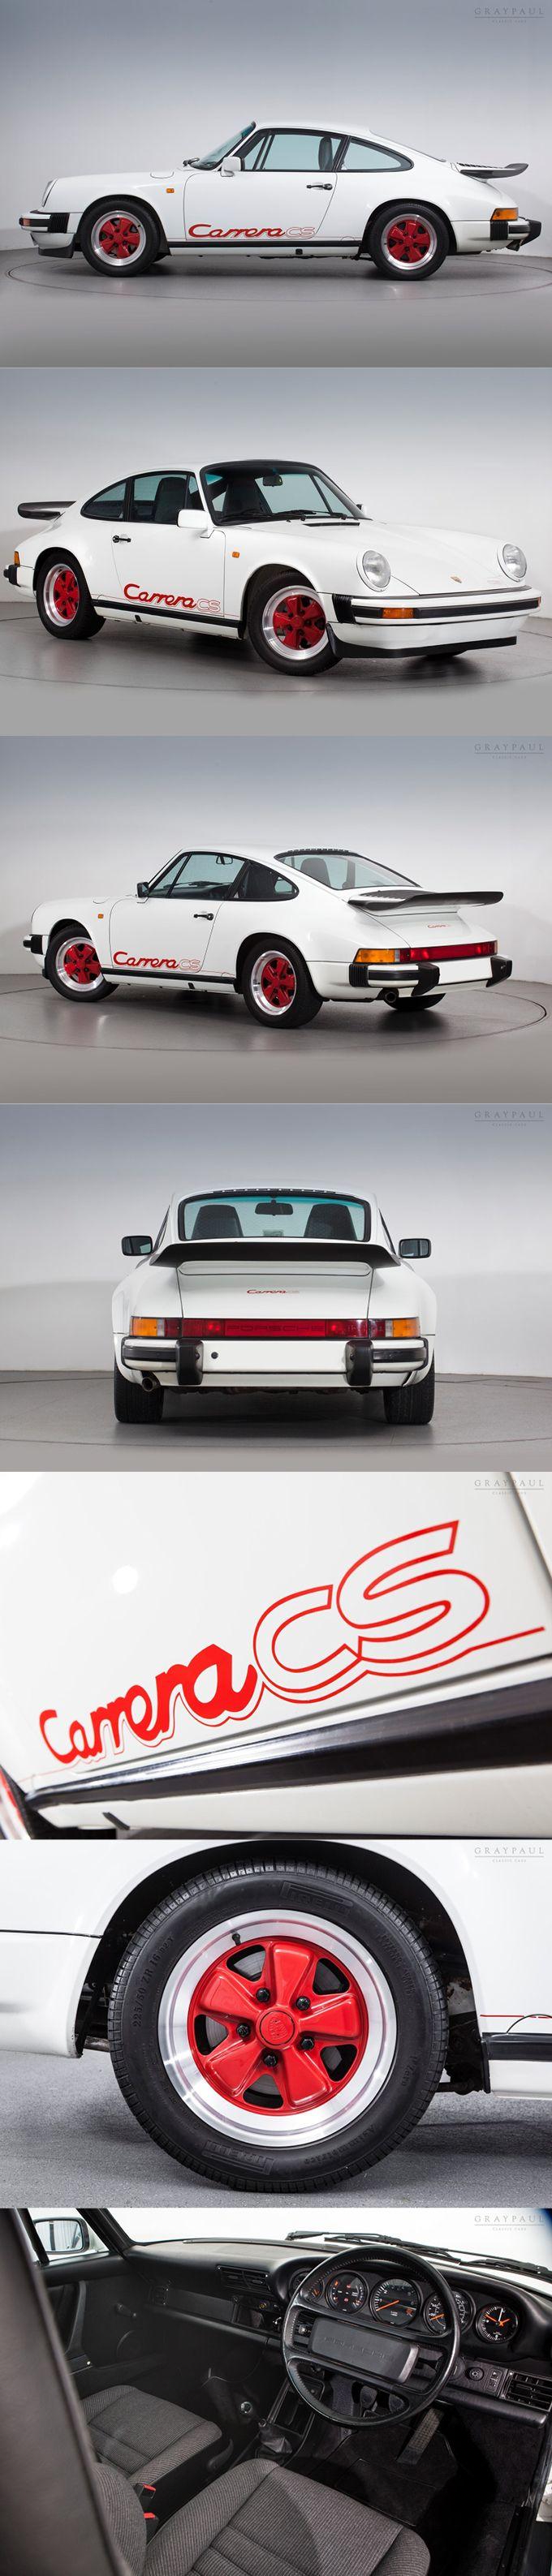 1987 Porsche 911 Carrera CS / Germany / Club Sport / red white / 340 manufactured